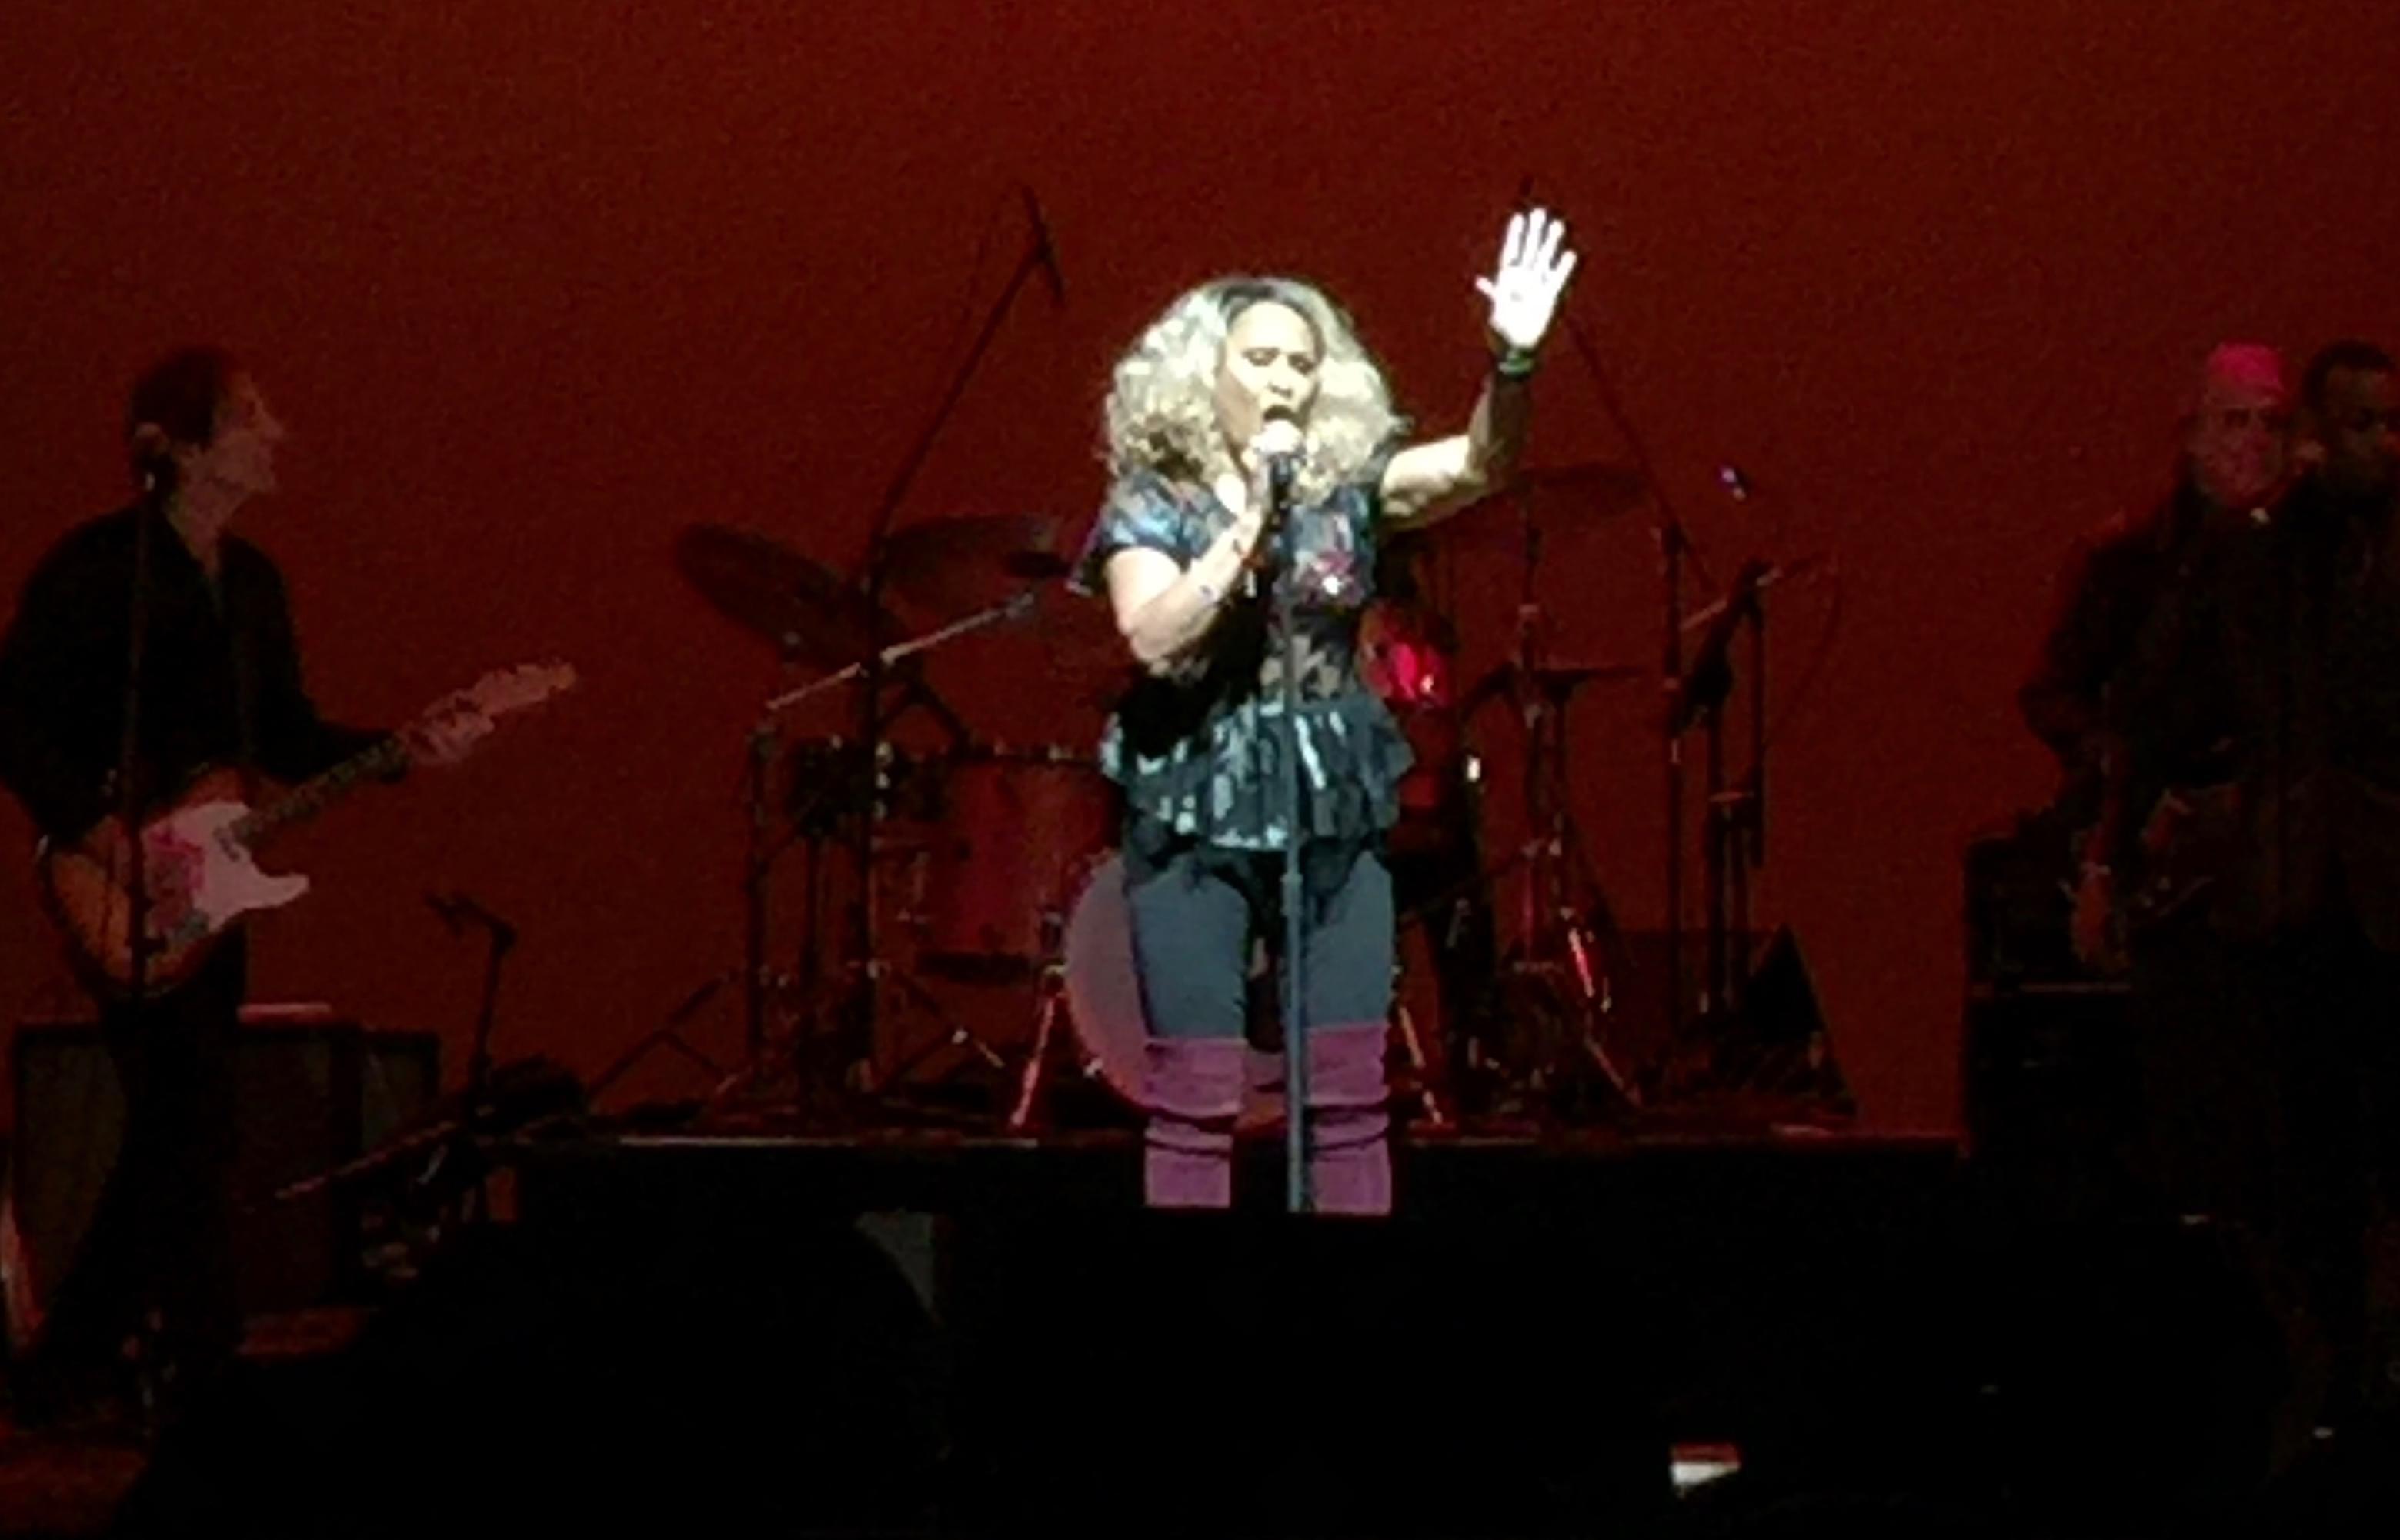 Darlene Love delivers powerhouse performance at Cranston's Park Theatre